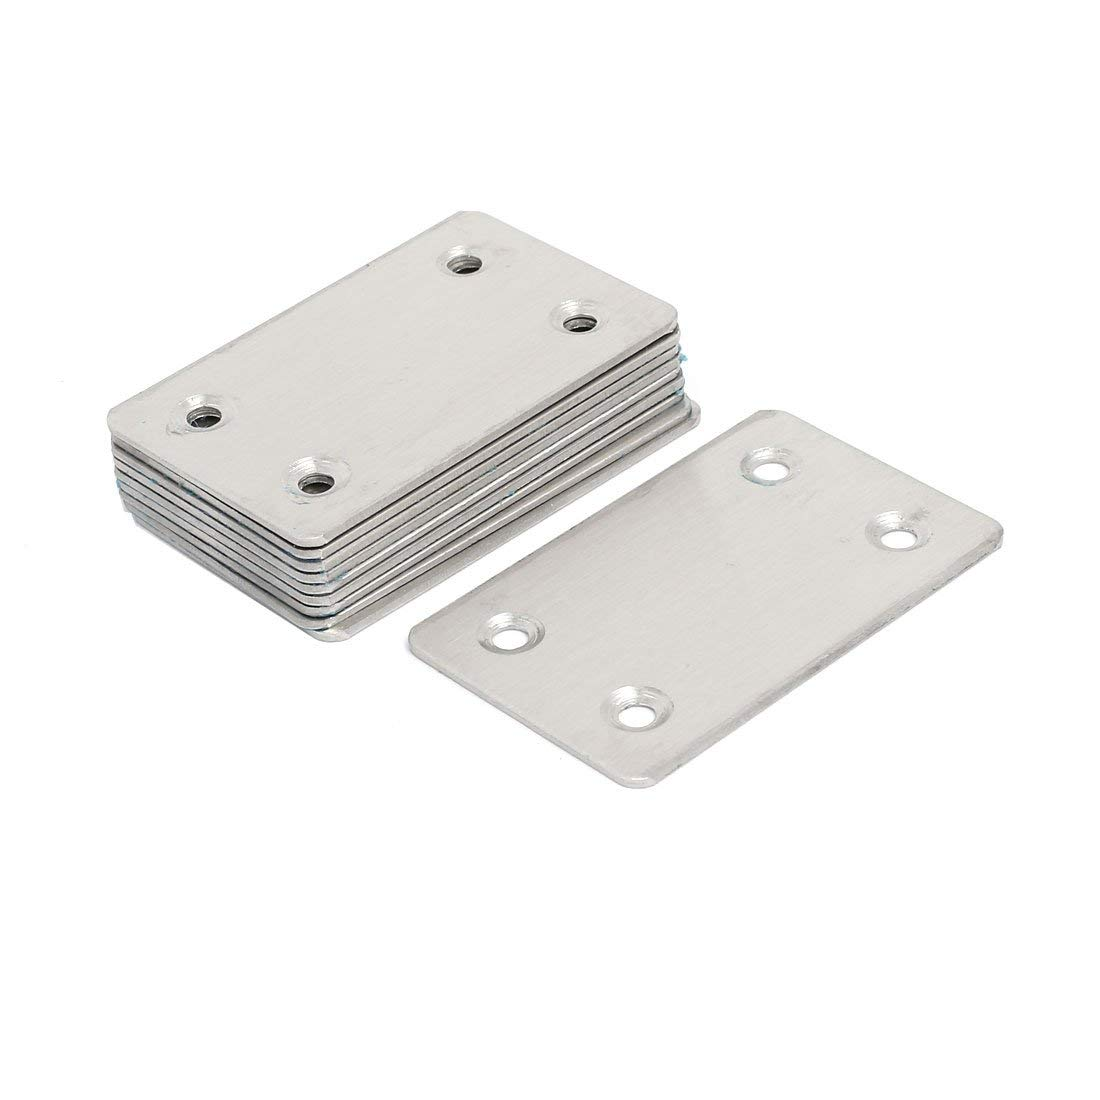 YXQ 50Pcs 2 Holes Flat Corner Brace Repair Plate Bracket 1.6 x 0.6 x 2mm Metal Stainless Steel Fixing Joining